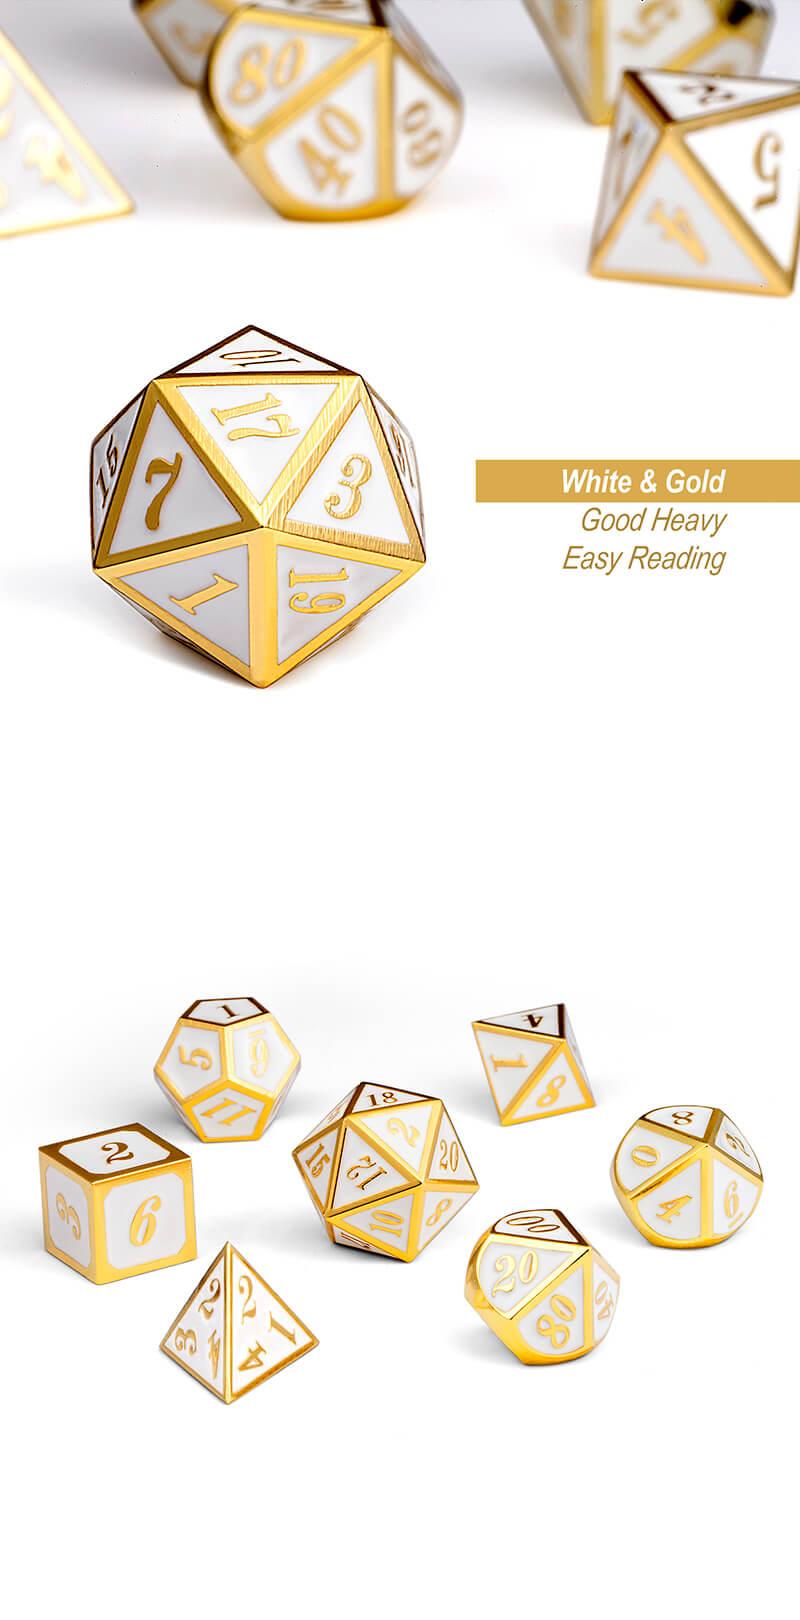 DAD510 - 7 White w/ Gold Metal Polyhedral Dice